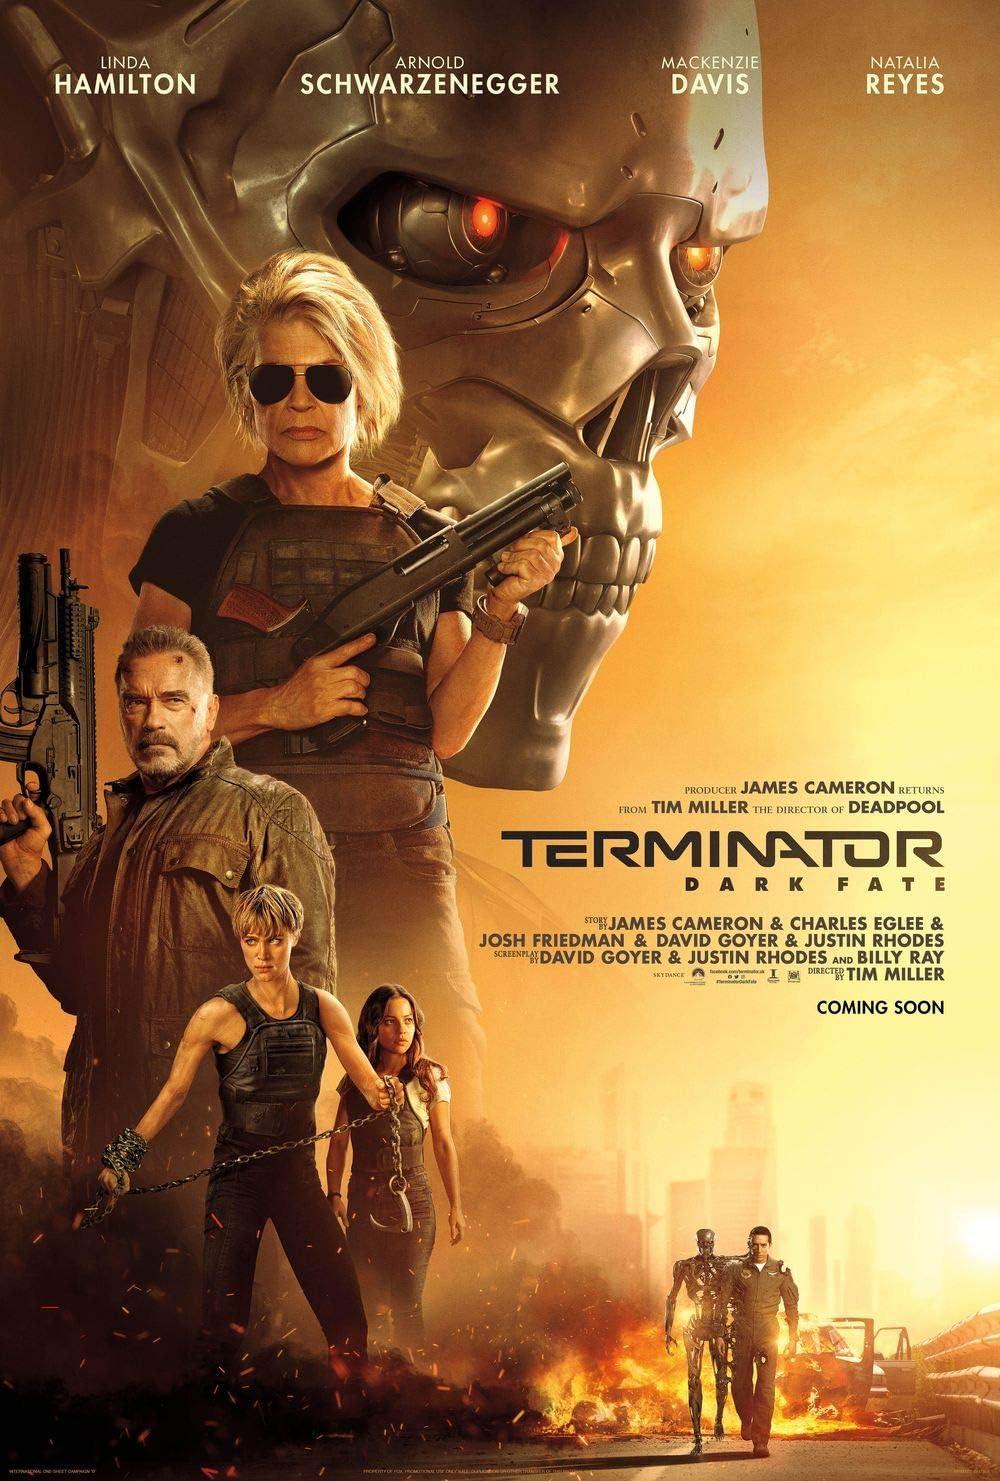 Lionbeen Terminator Dark Fate - Movie Poster - Filmplakat 70 X 45 cm. (NOT  A DVD): Amazon.de: Küche & Haushalt